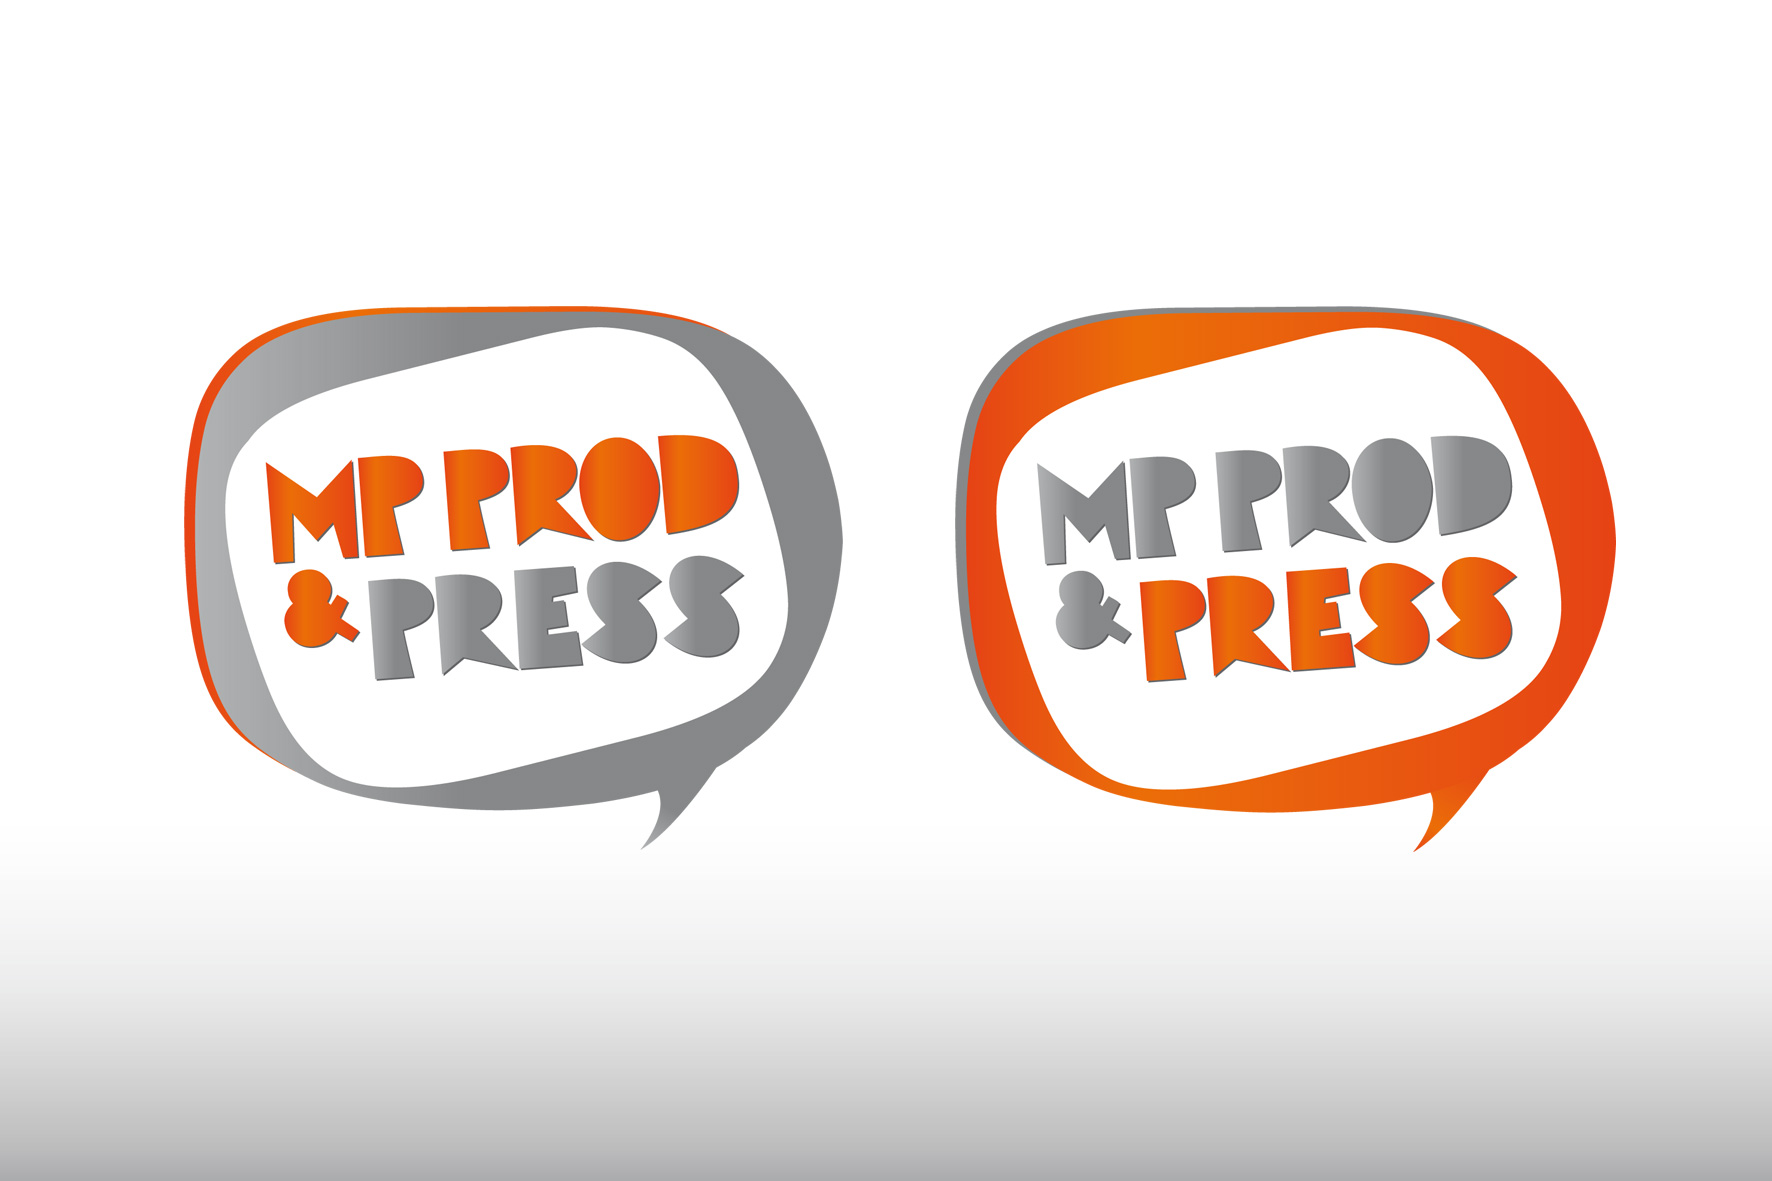 MP Prod & Press